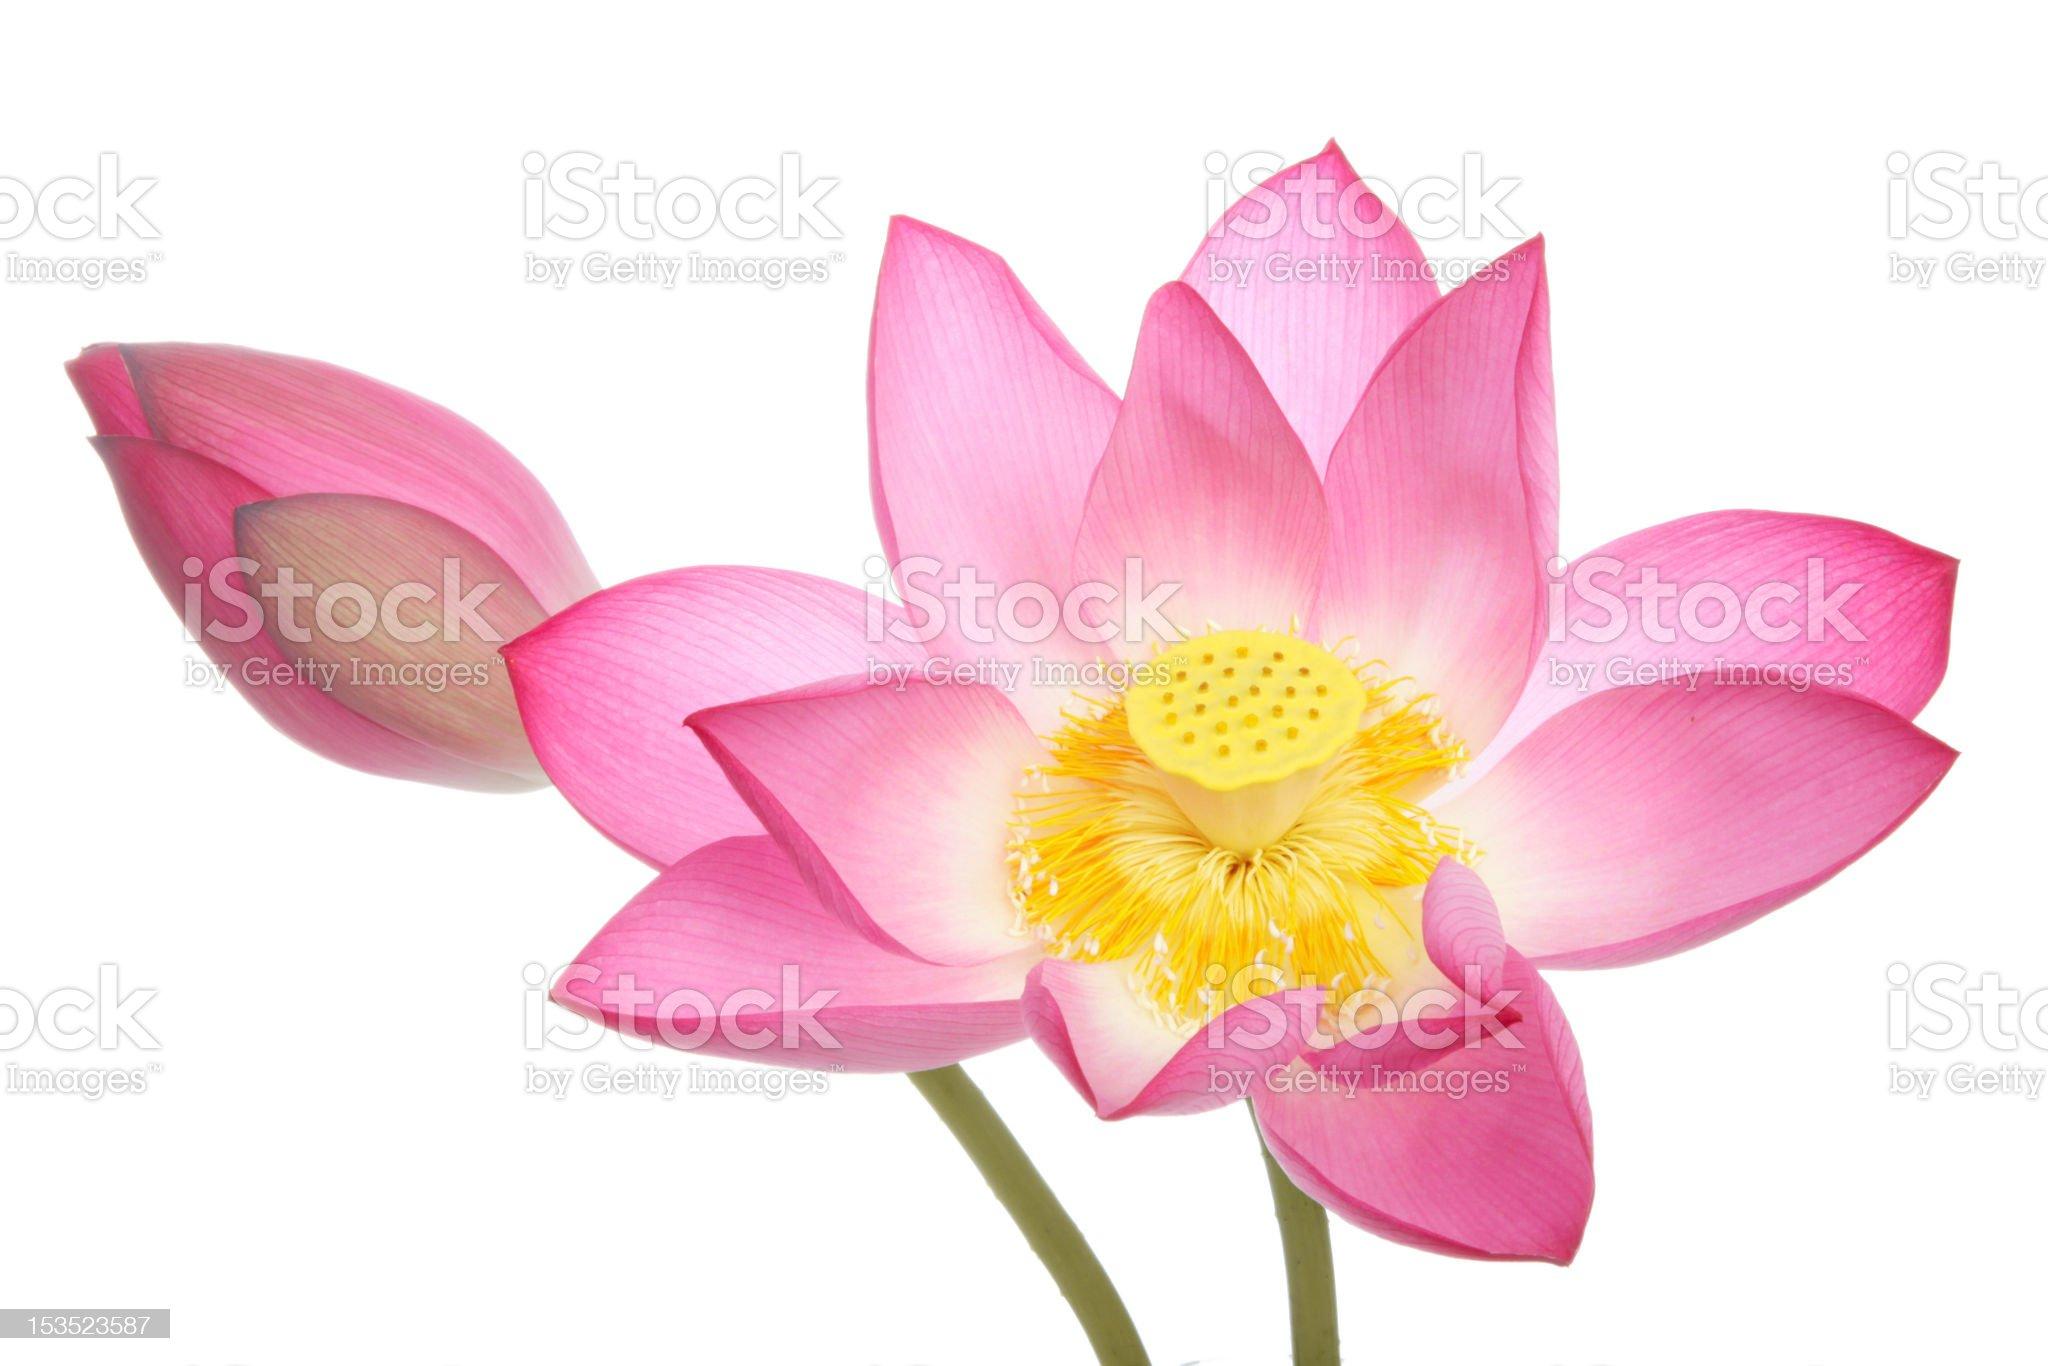 Lotus flowers on white background royalty-free stock photo